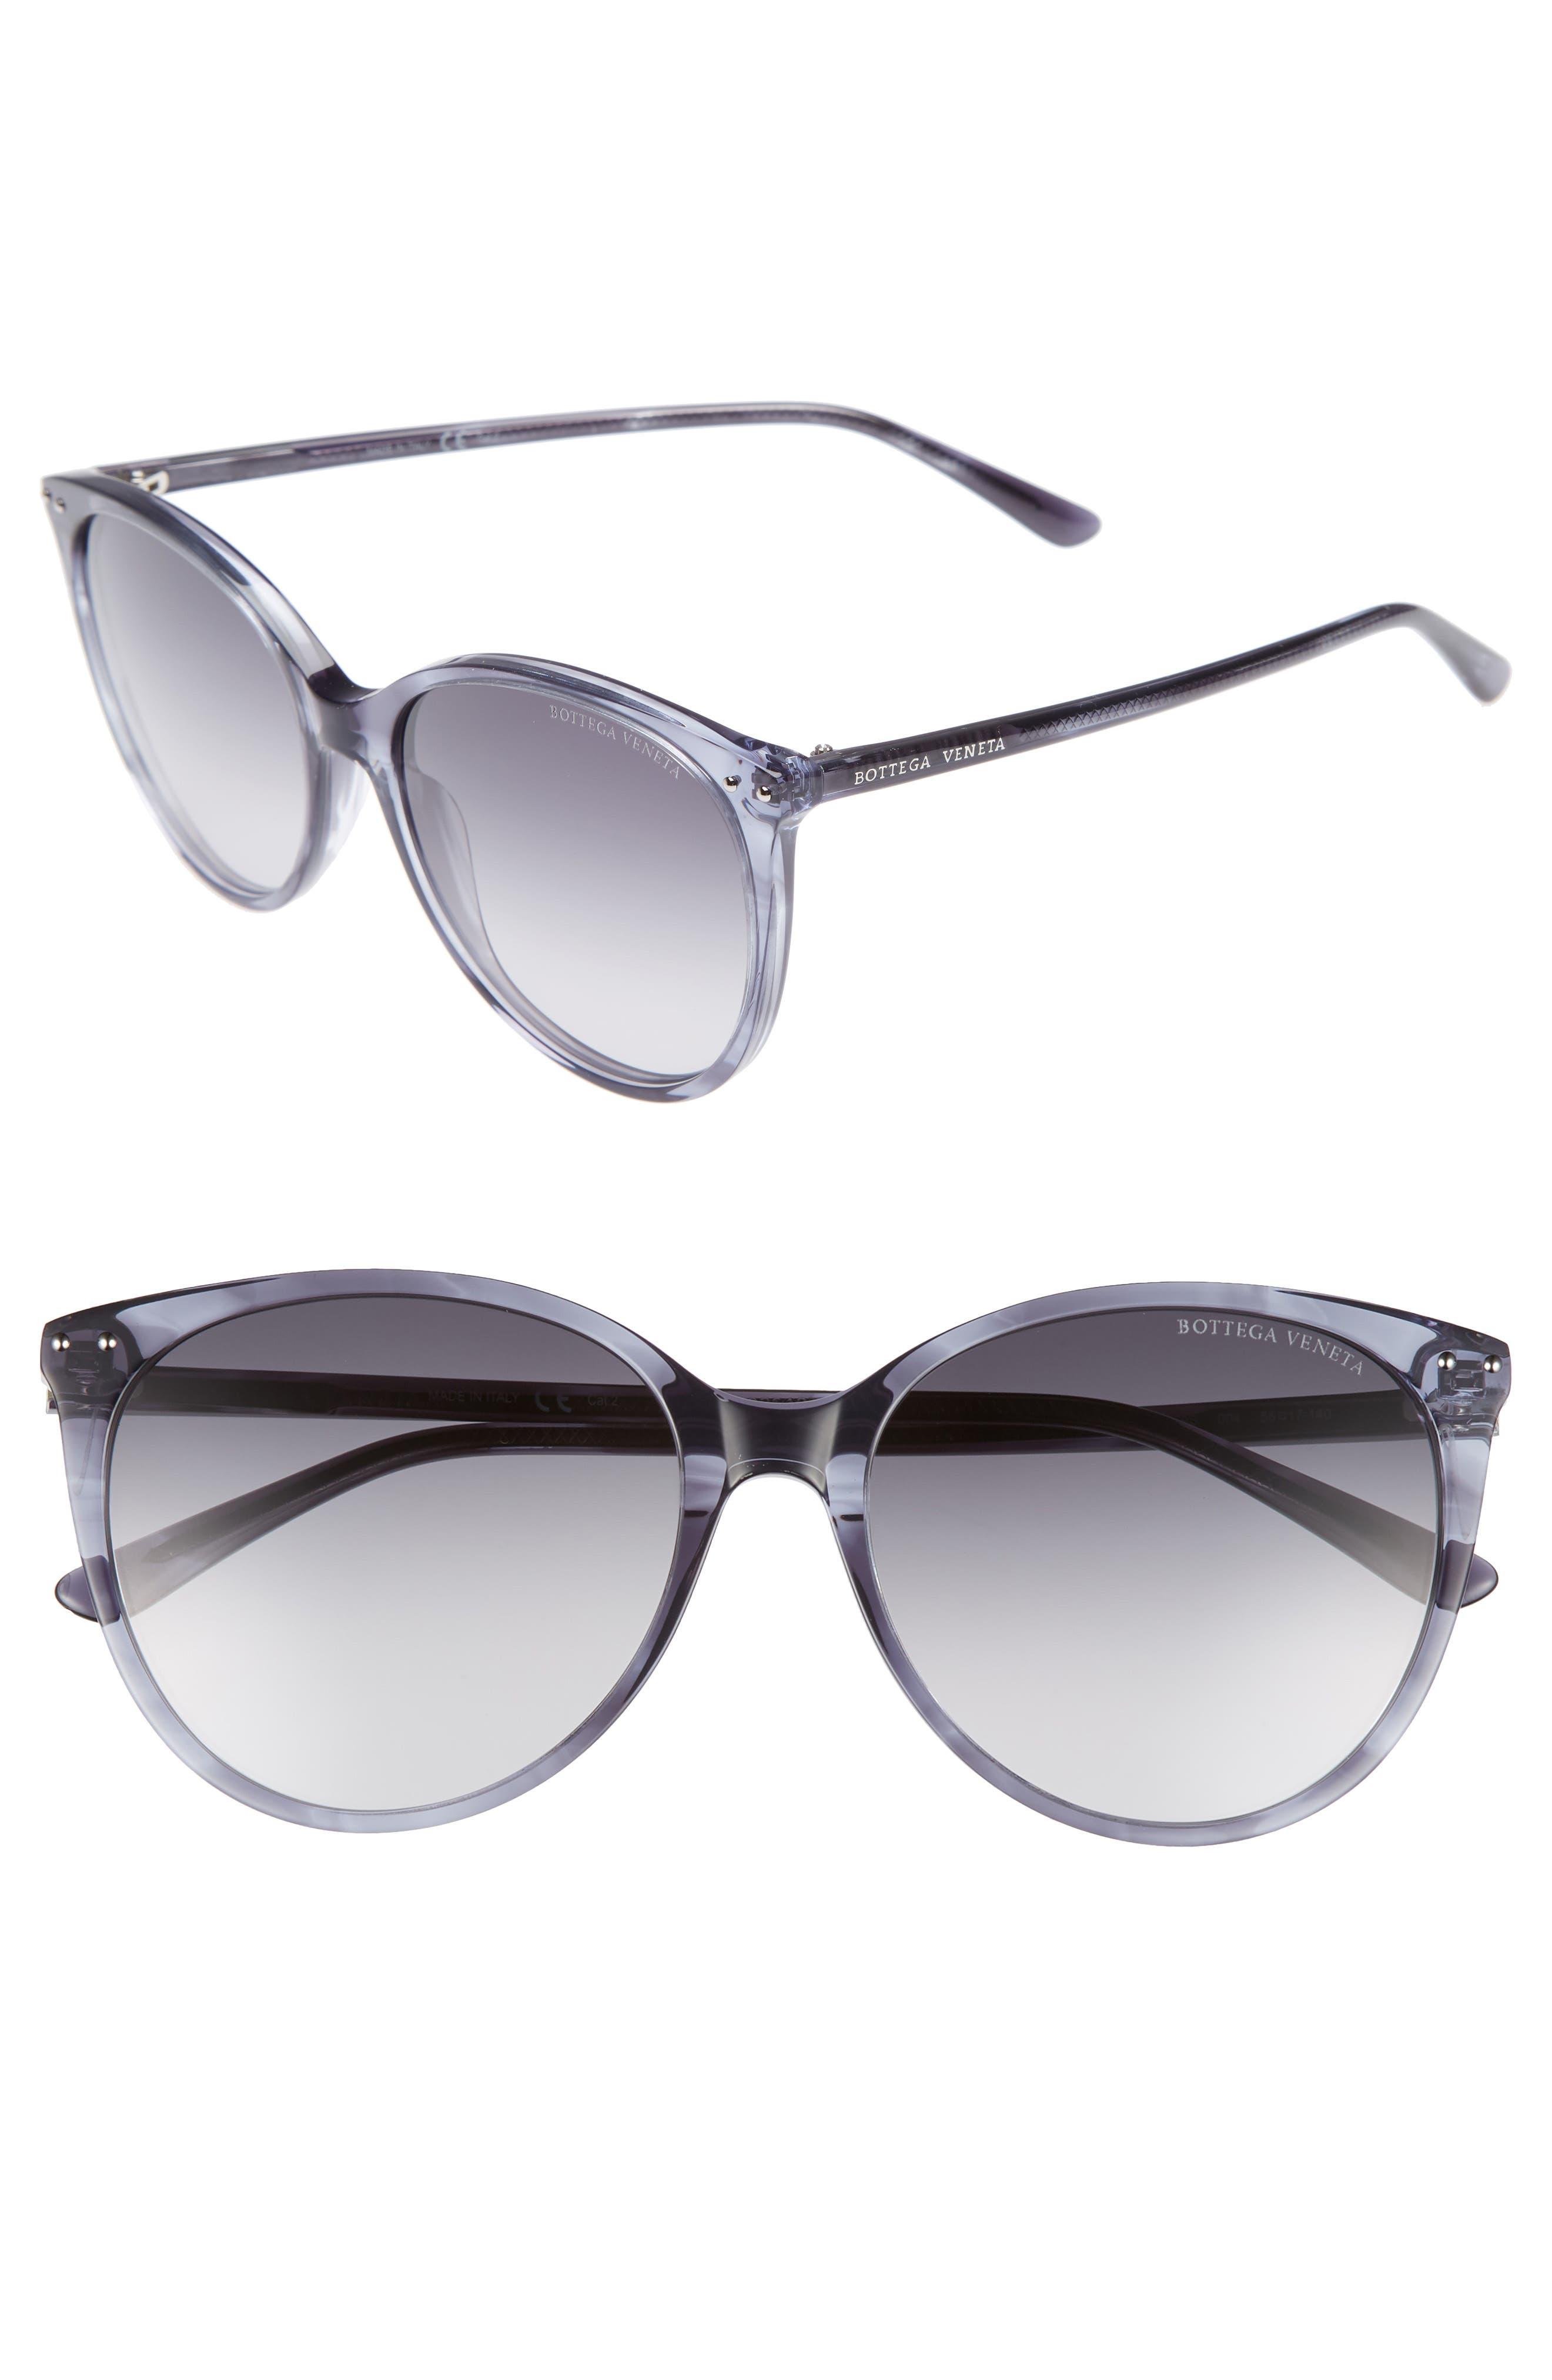 55mm Cat Eye Sunglasses,                         Main,                         color, GREY